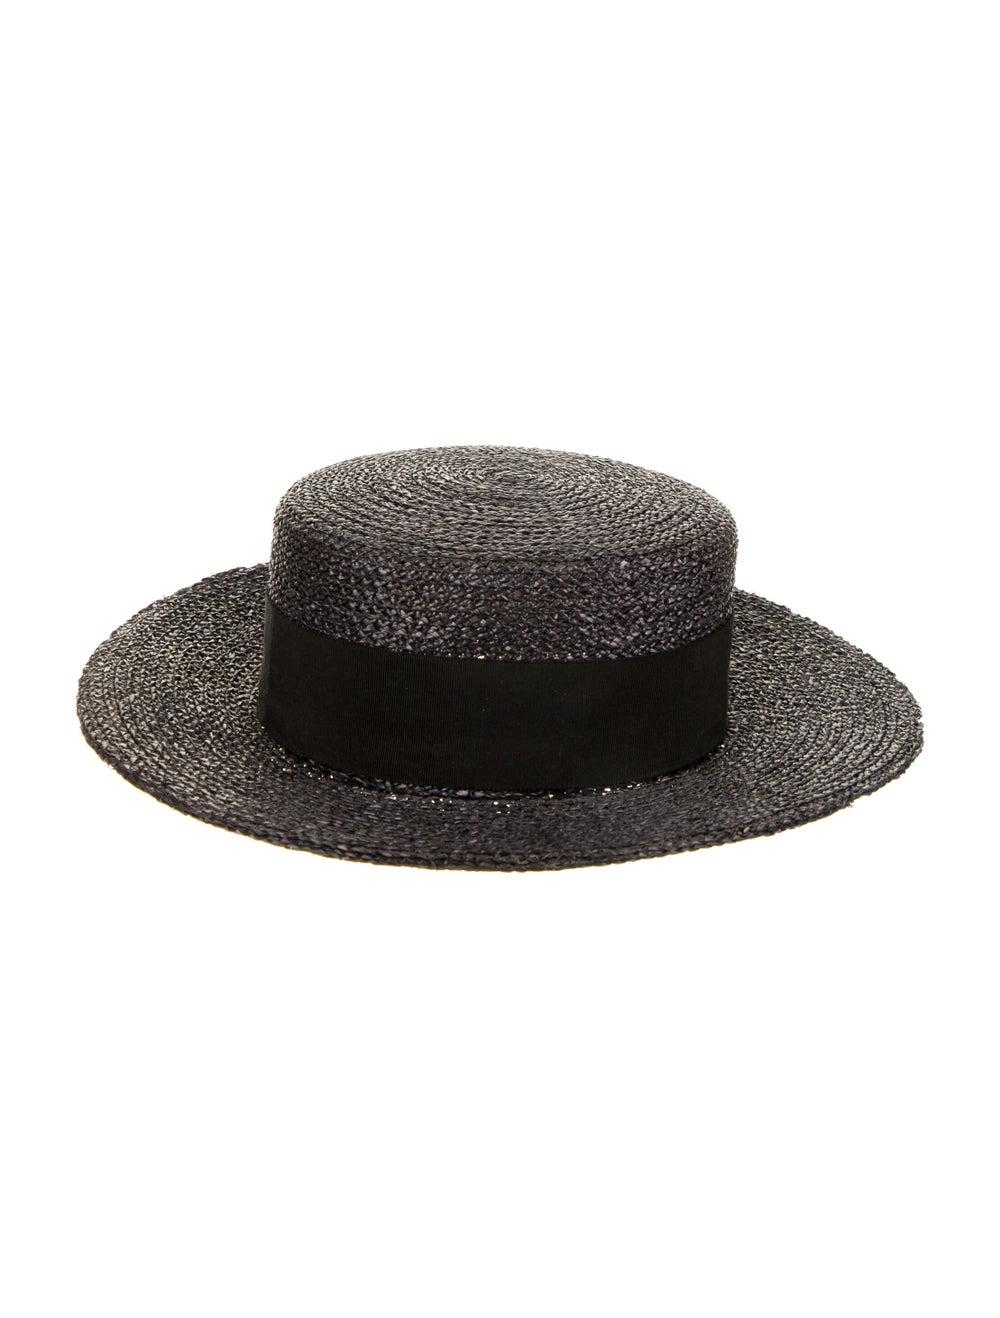 Chanel Straw Wide-Brim Sun Hat Black - image 2